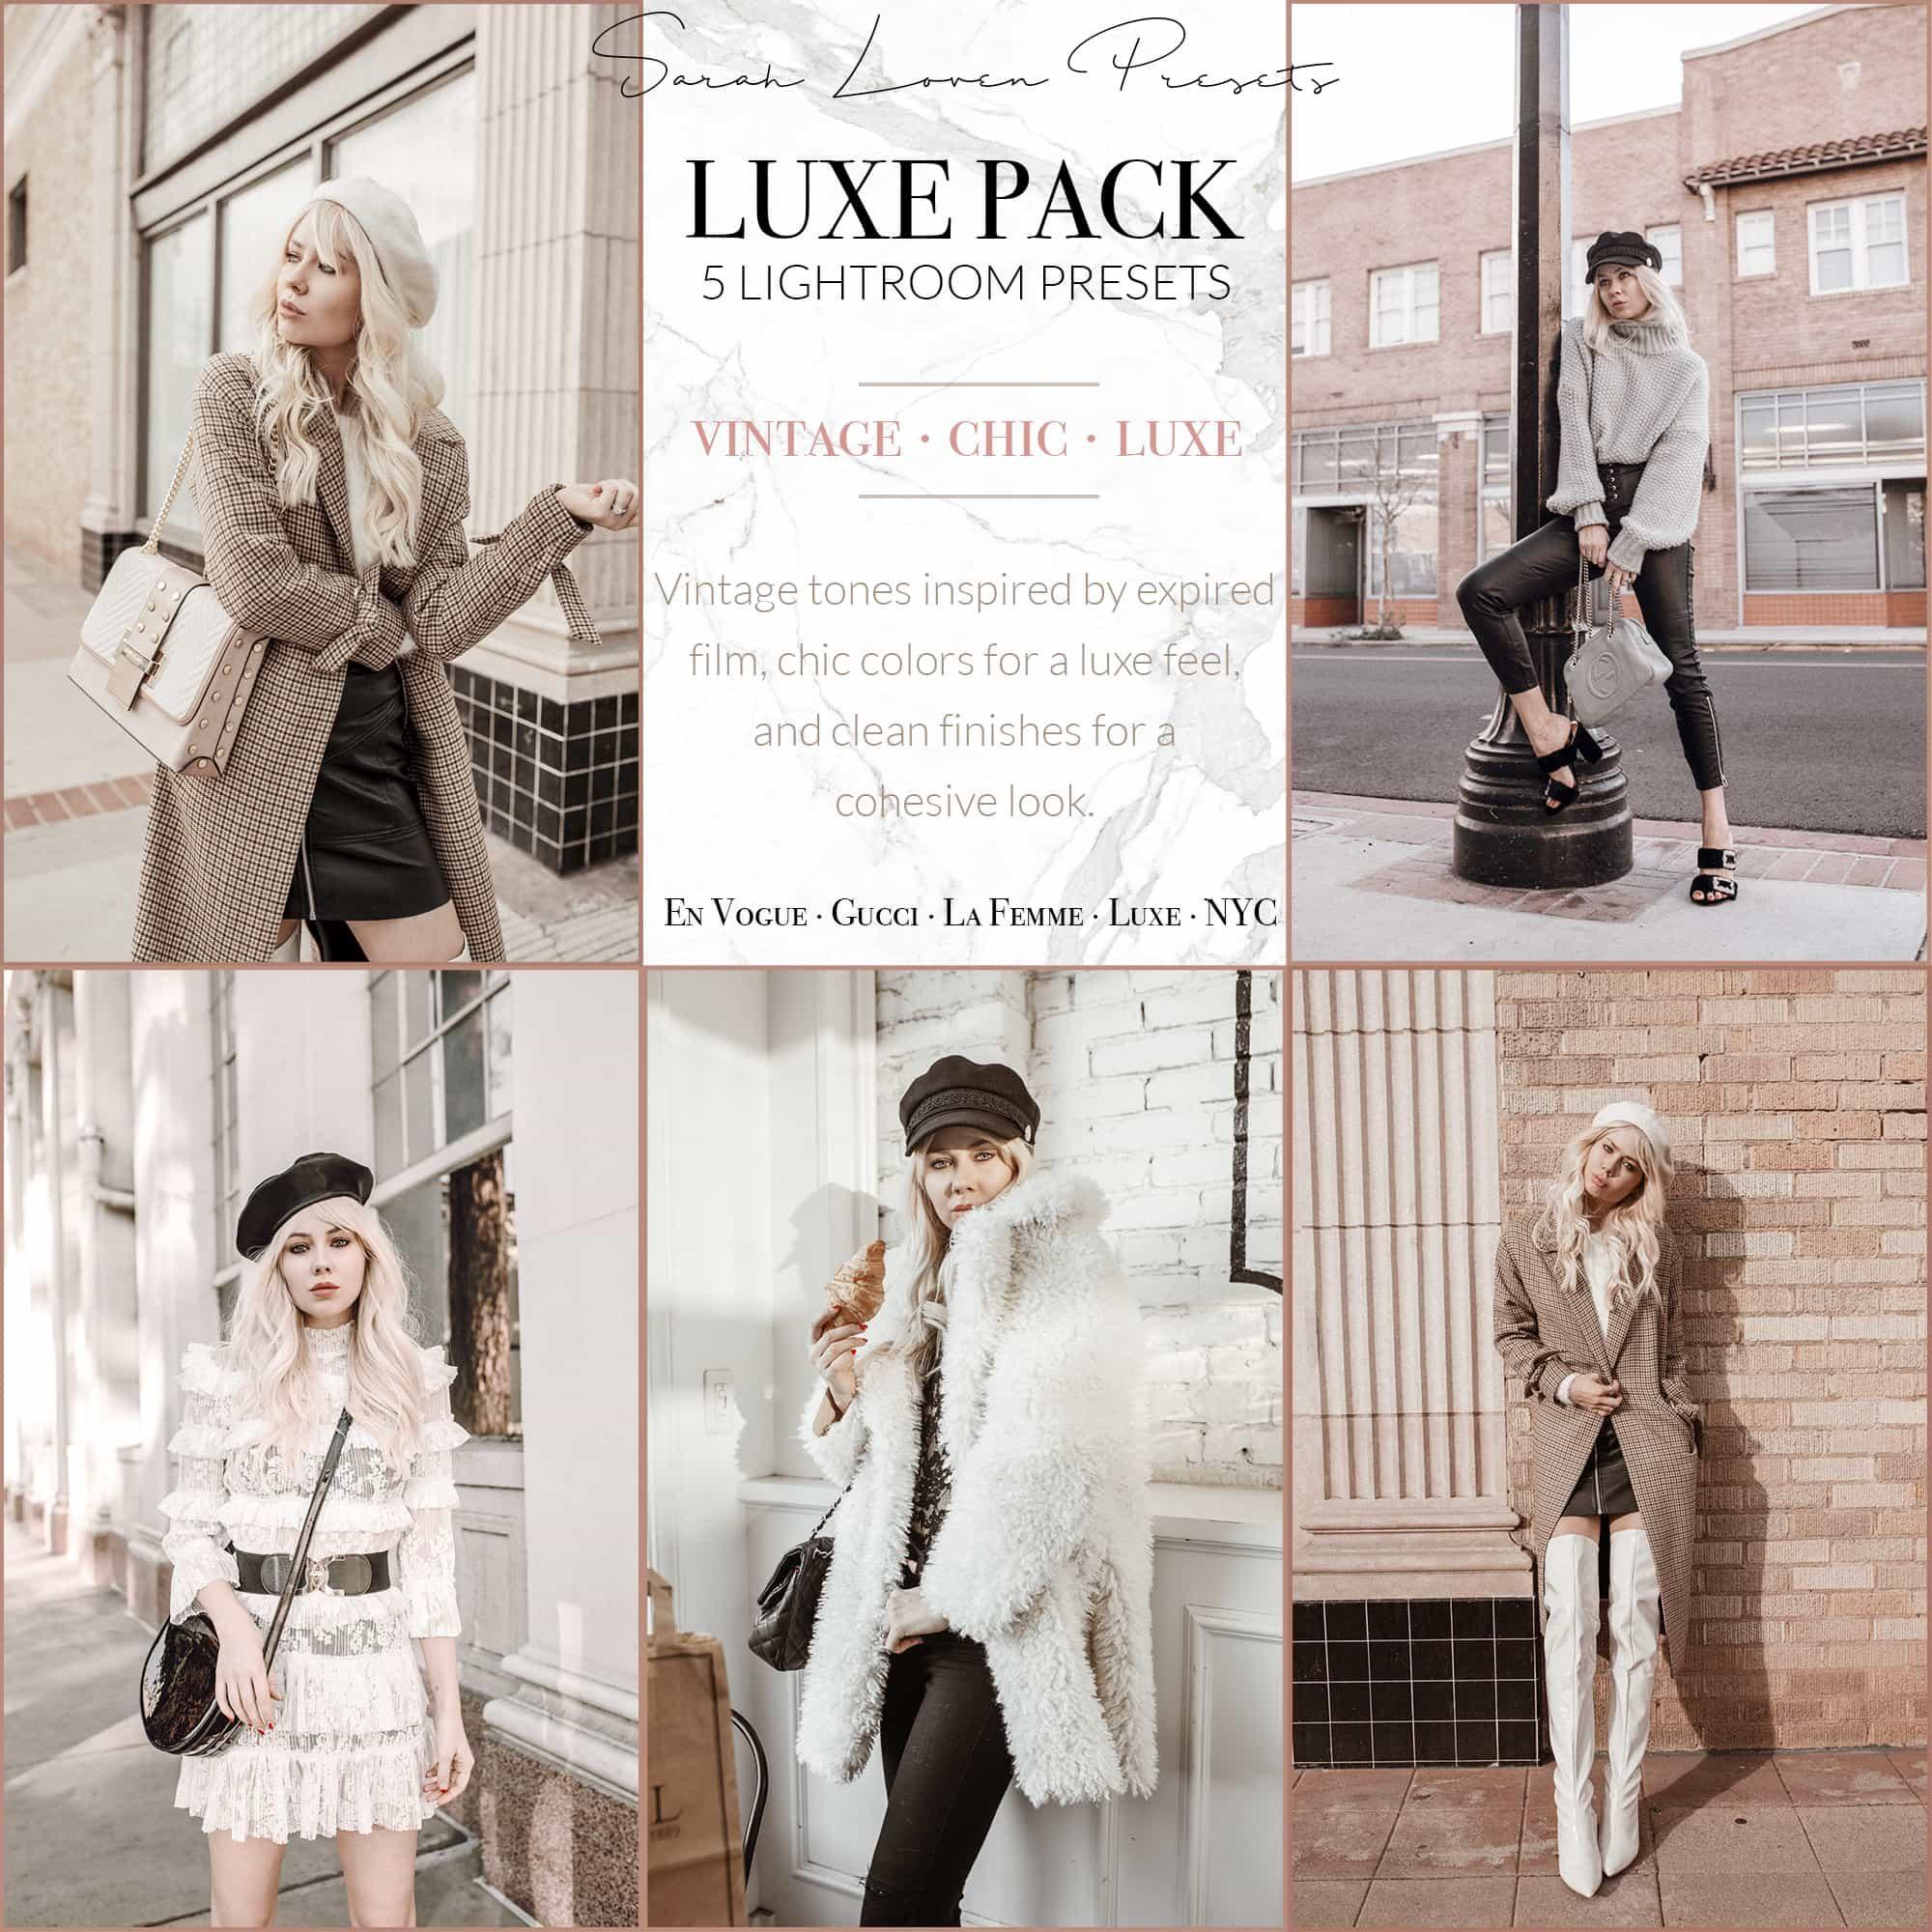 SarahLoven-Luxe-Pack-Lightroom-Presets